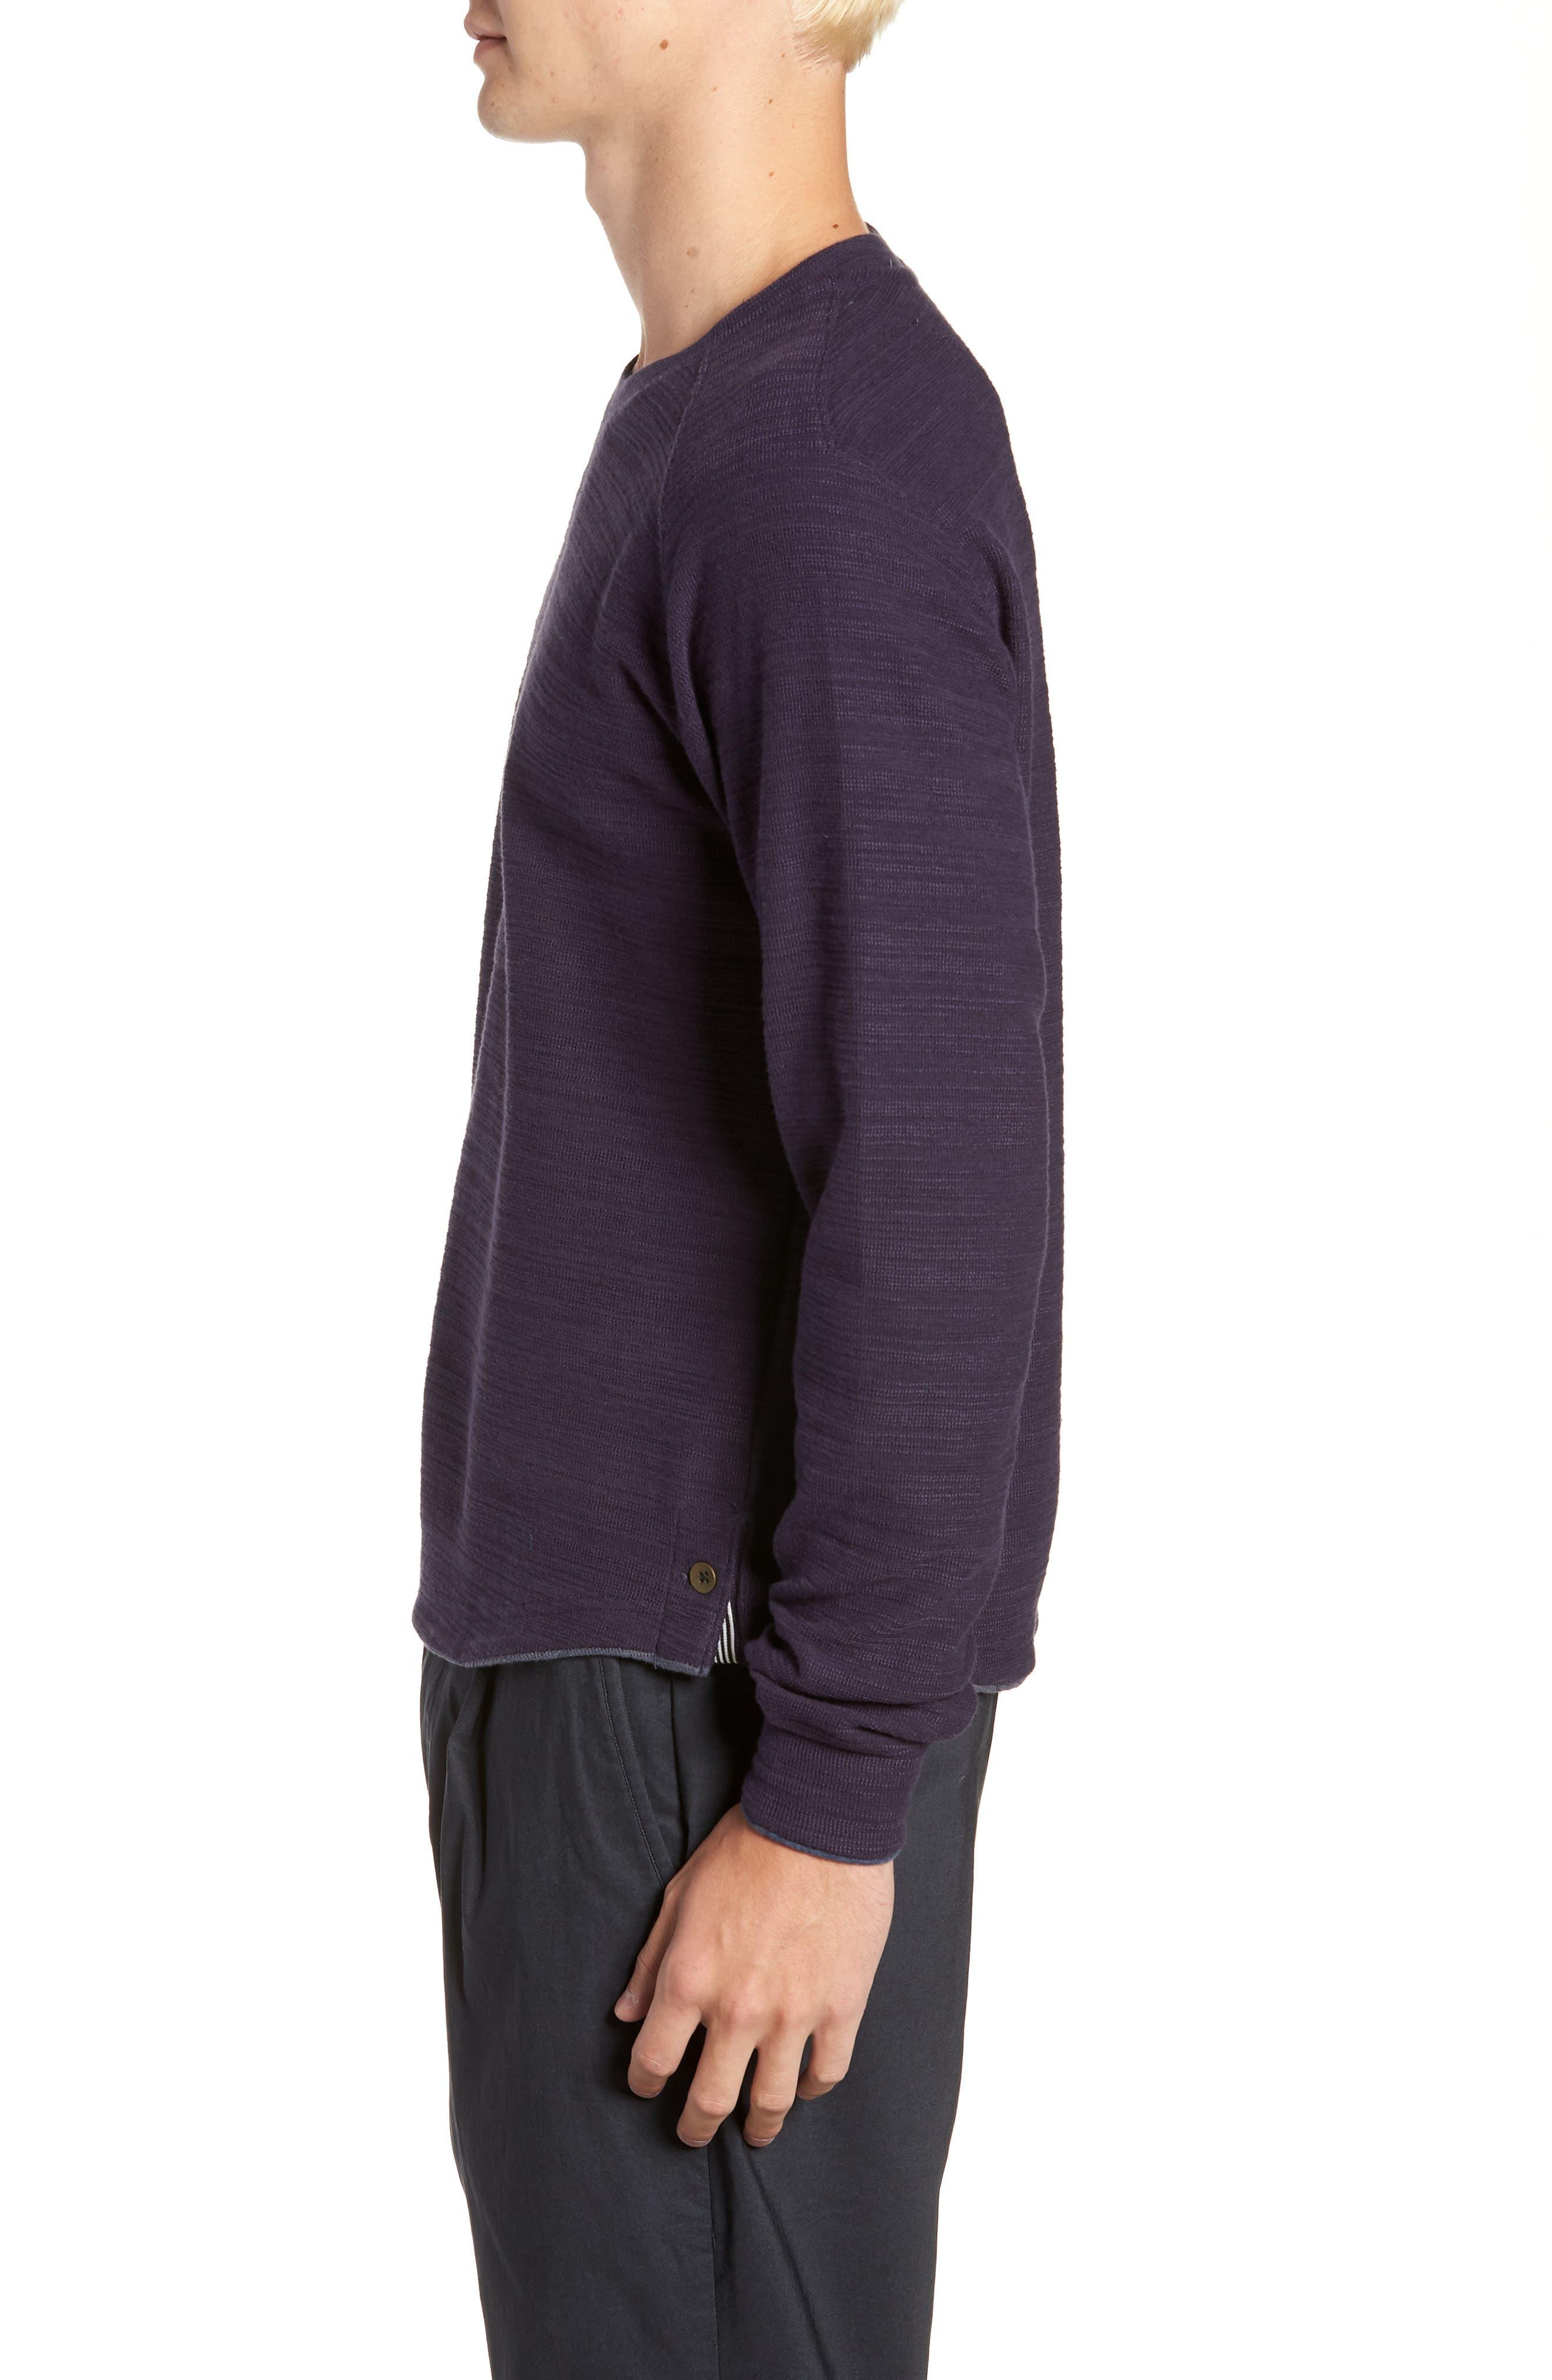 250 Loft Slubbed Crewneck Sweater,                             Alternate thumbnail 3, color,                             NAVY